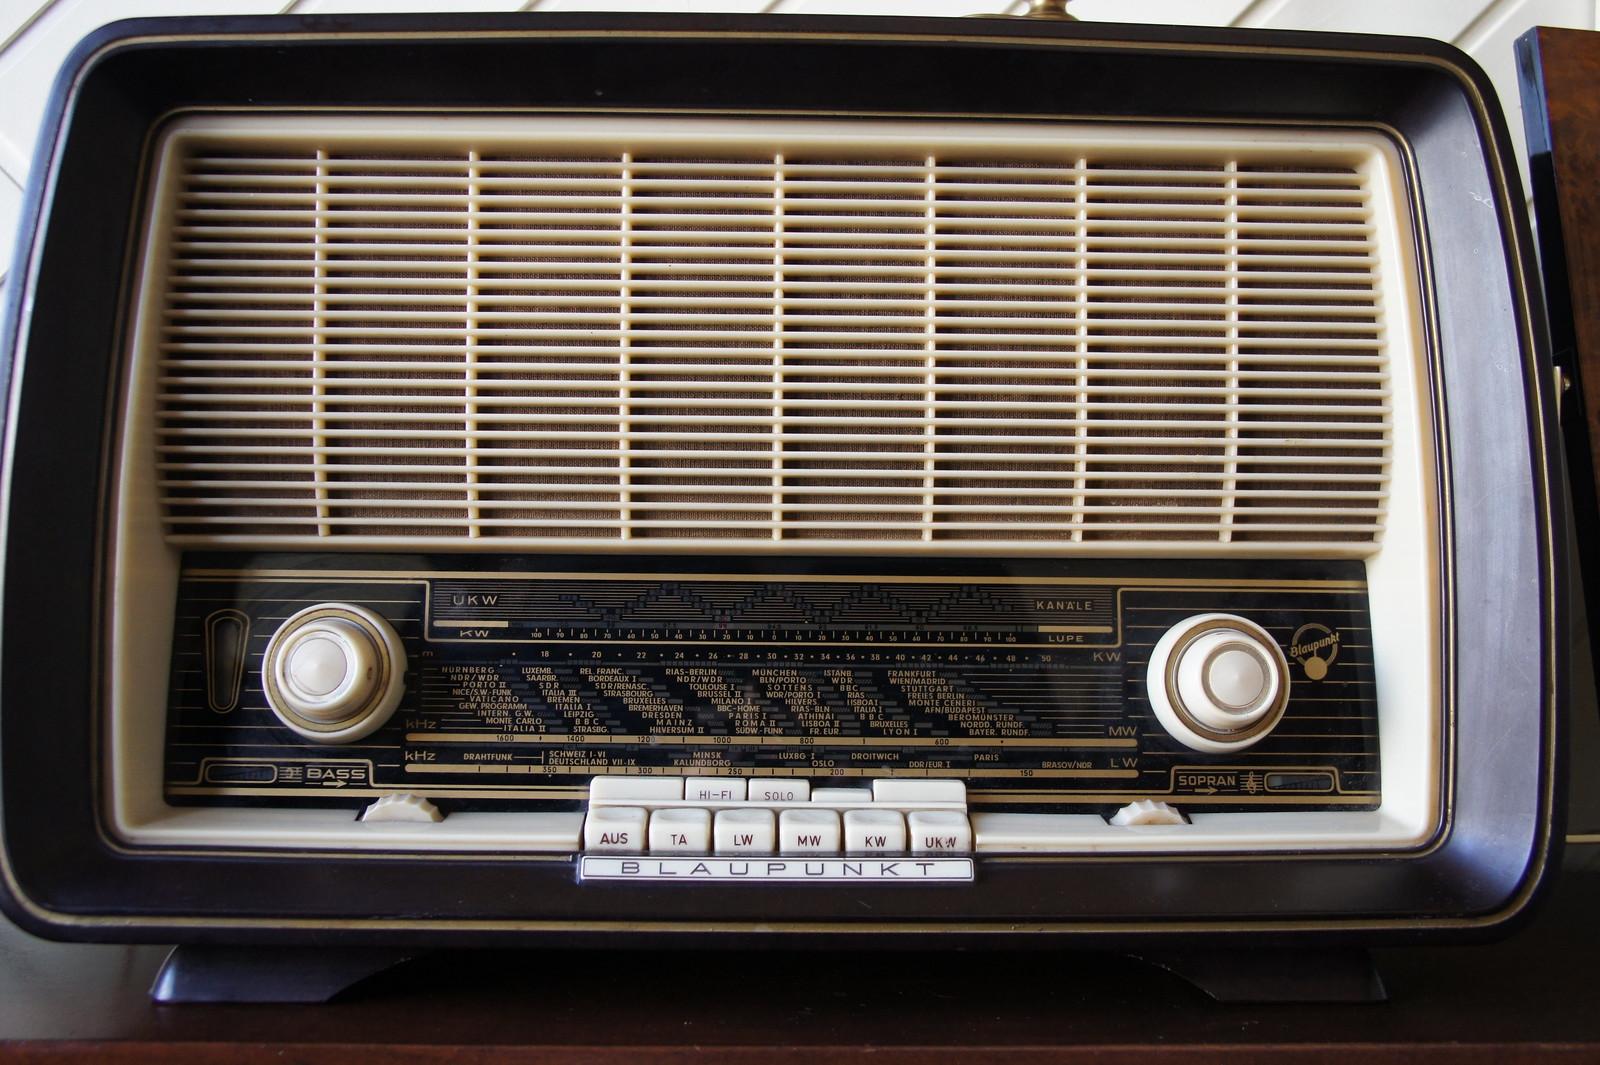 Radio Blaupunkt | by peetje2